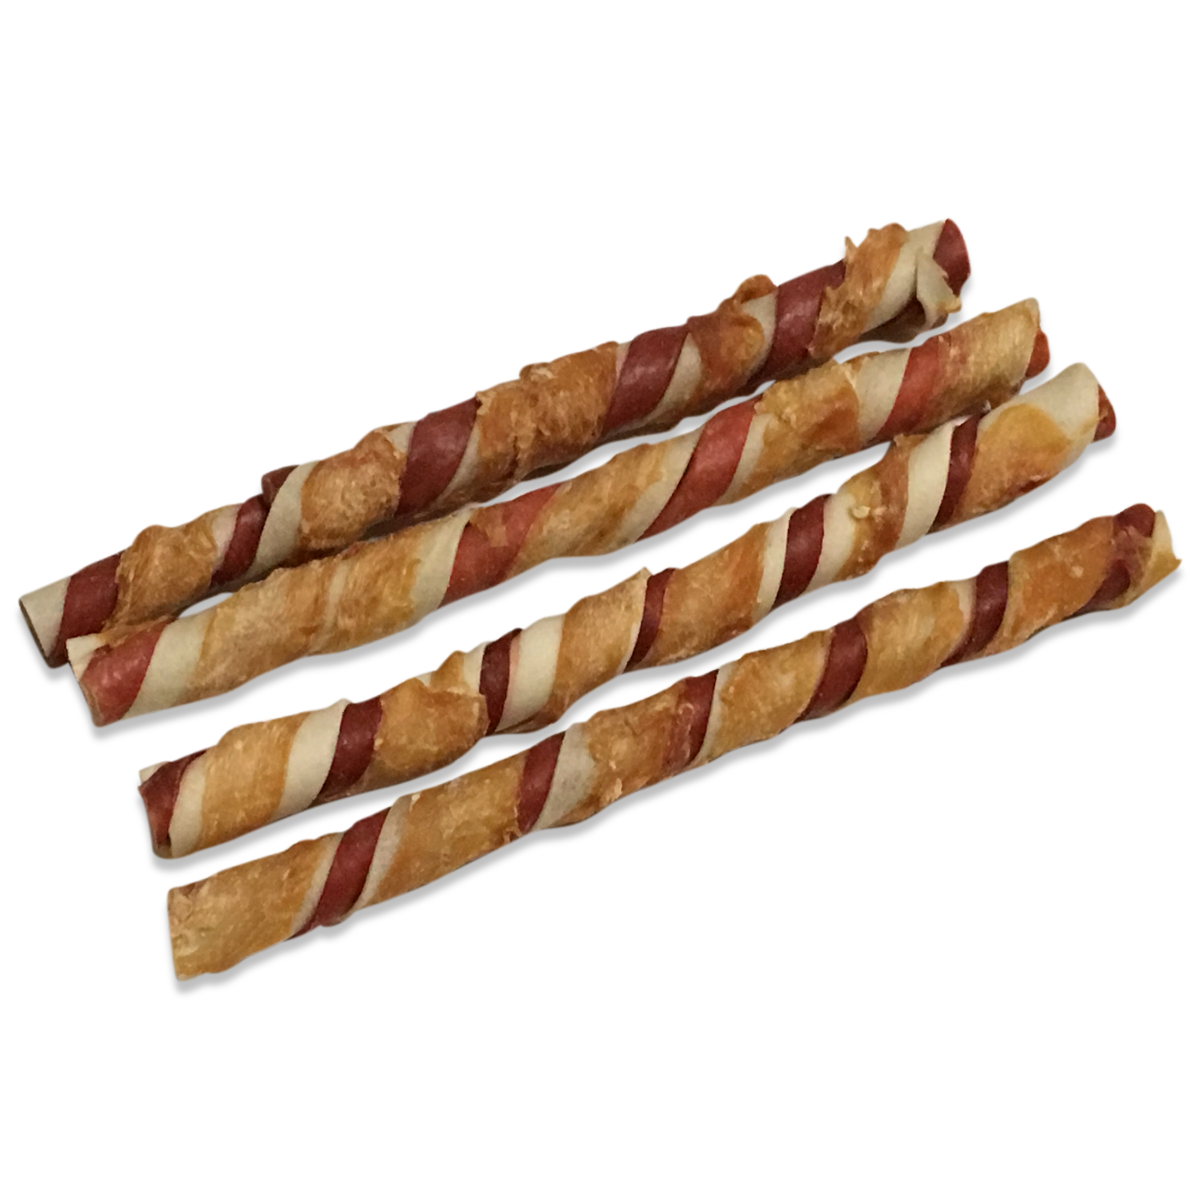 Wrap spcial van Prime Hide 25 cm. Rawhide (gedroogde runderhuid) omwikkeld met varken en kip Een ware delicatesse voor elke hond.Zak 280 gr. / 4 stuks.